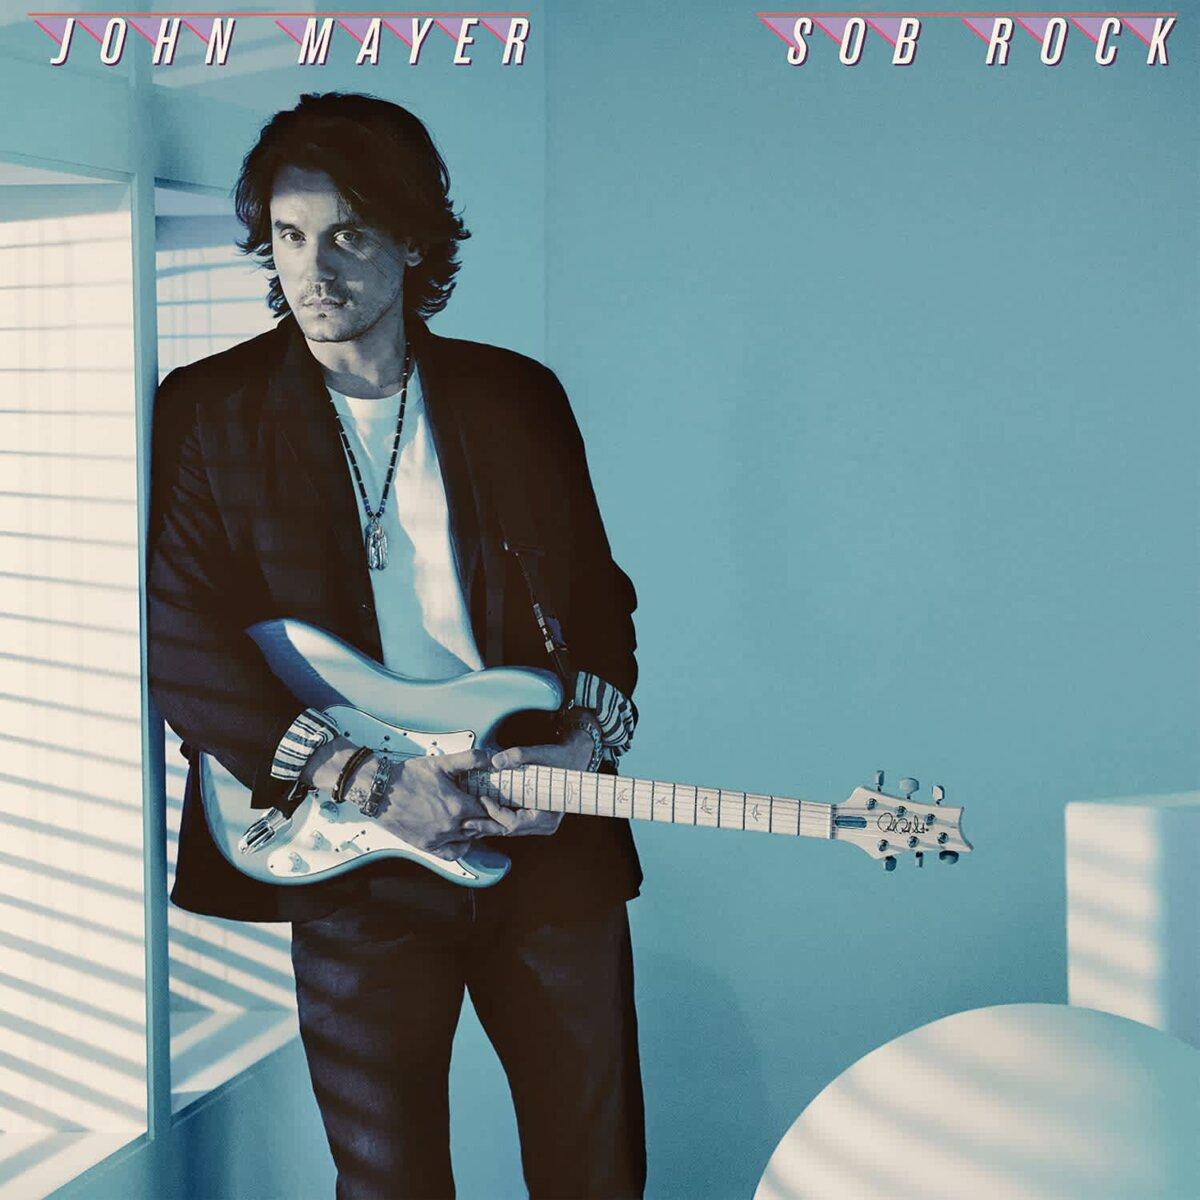 John Mayer - Sob Rock, album cover